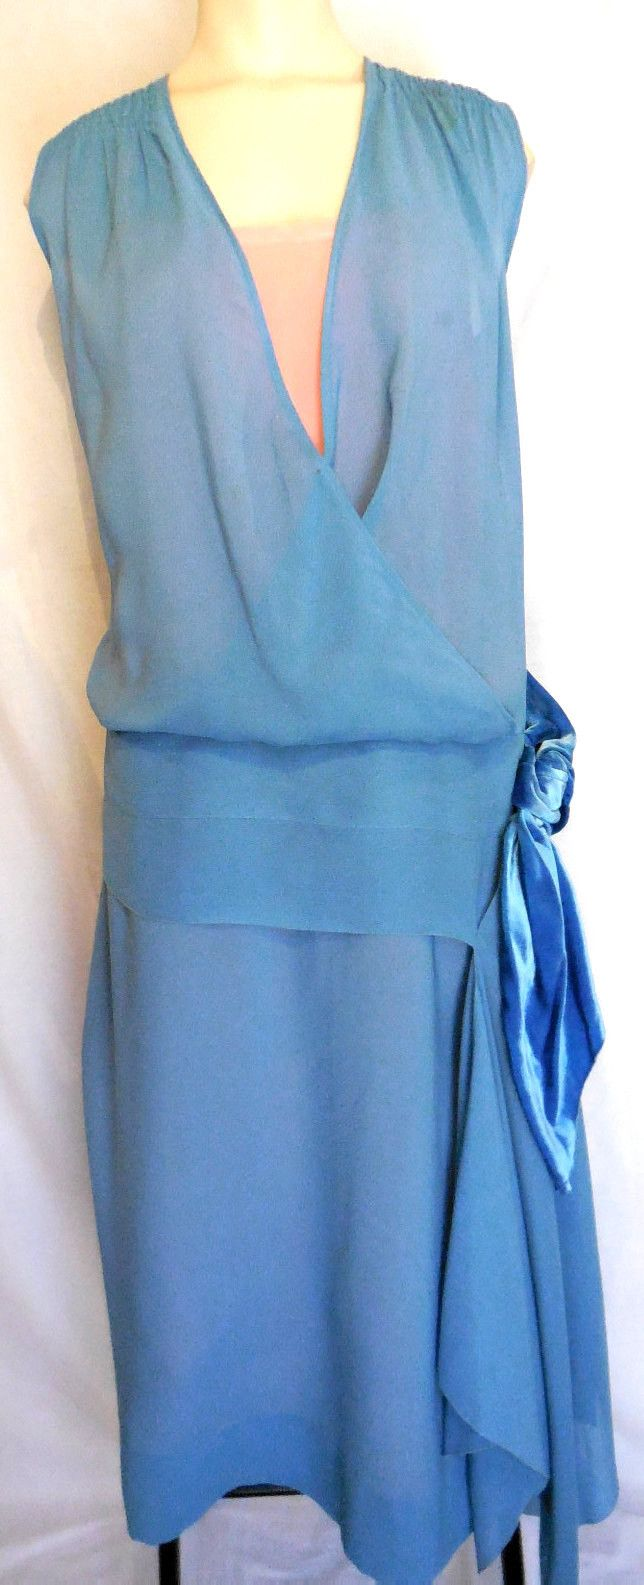 ... Authentic...1920s...silk flapper dress...very pretty...rare sz xxl